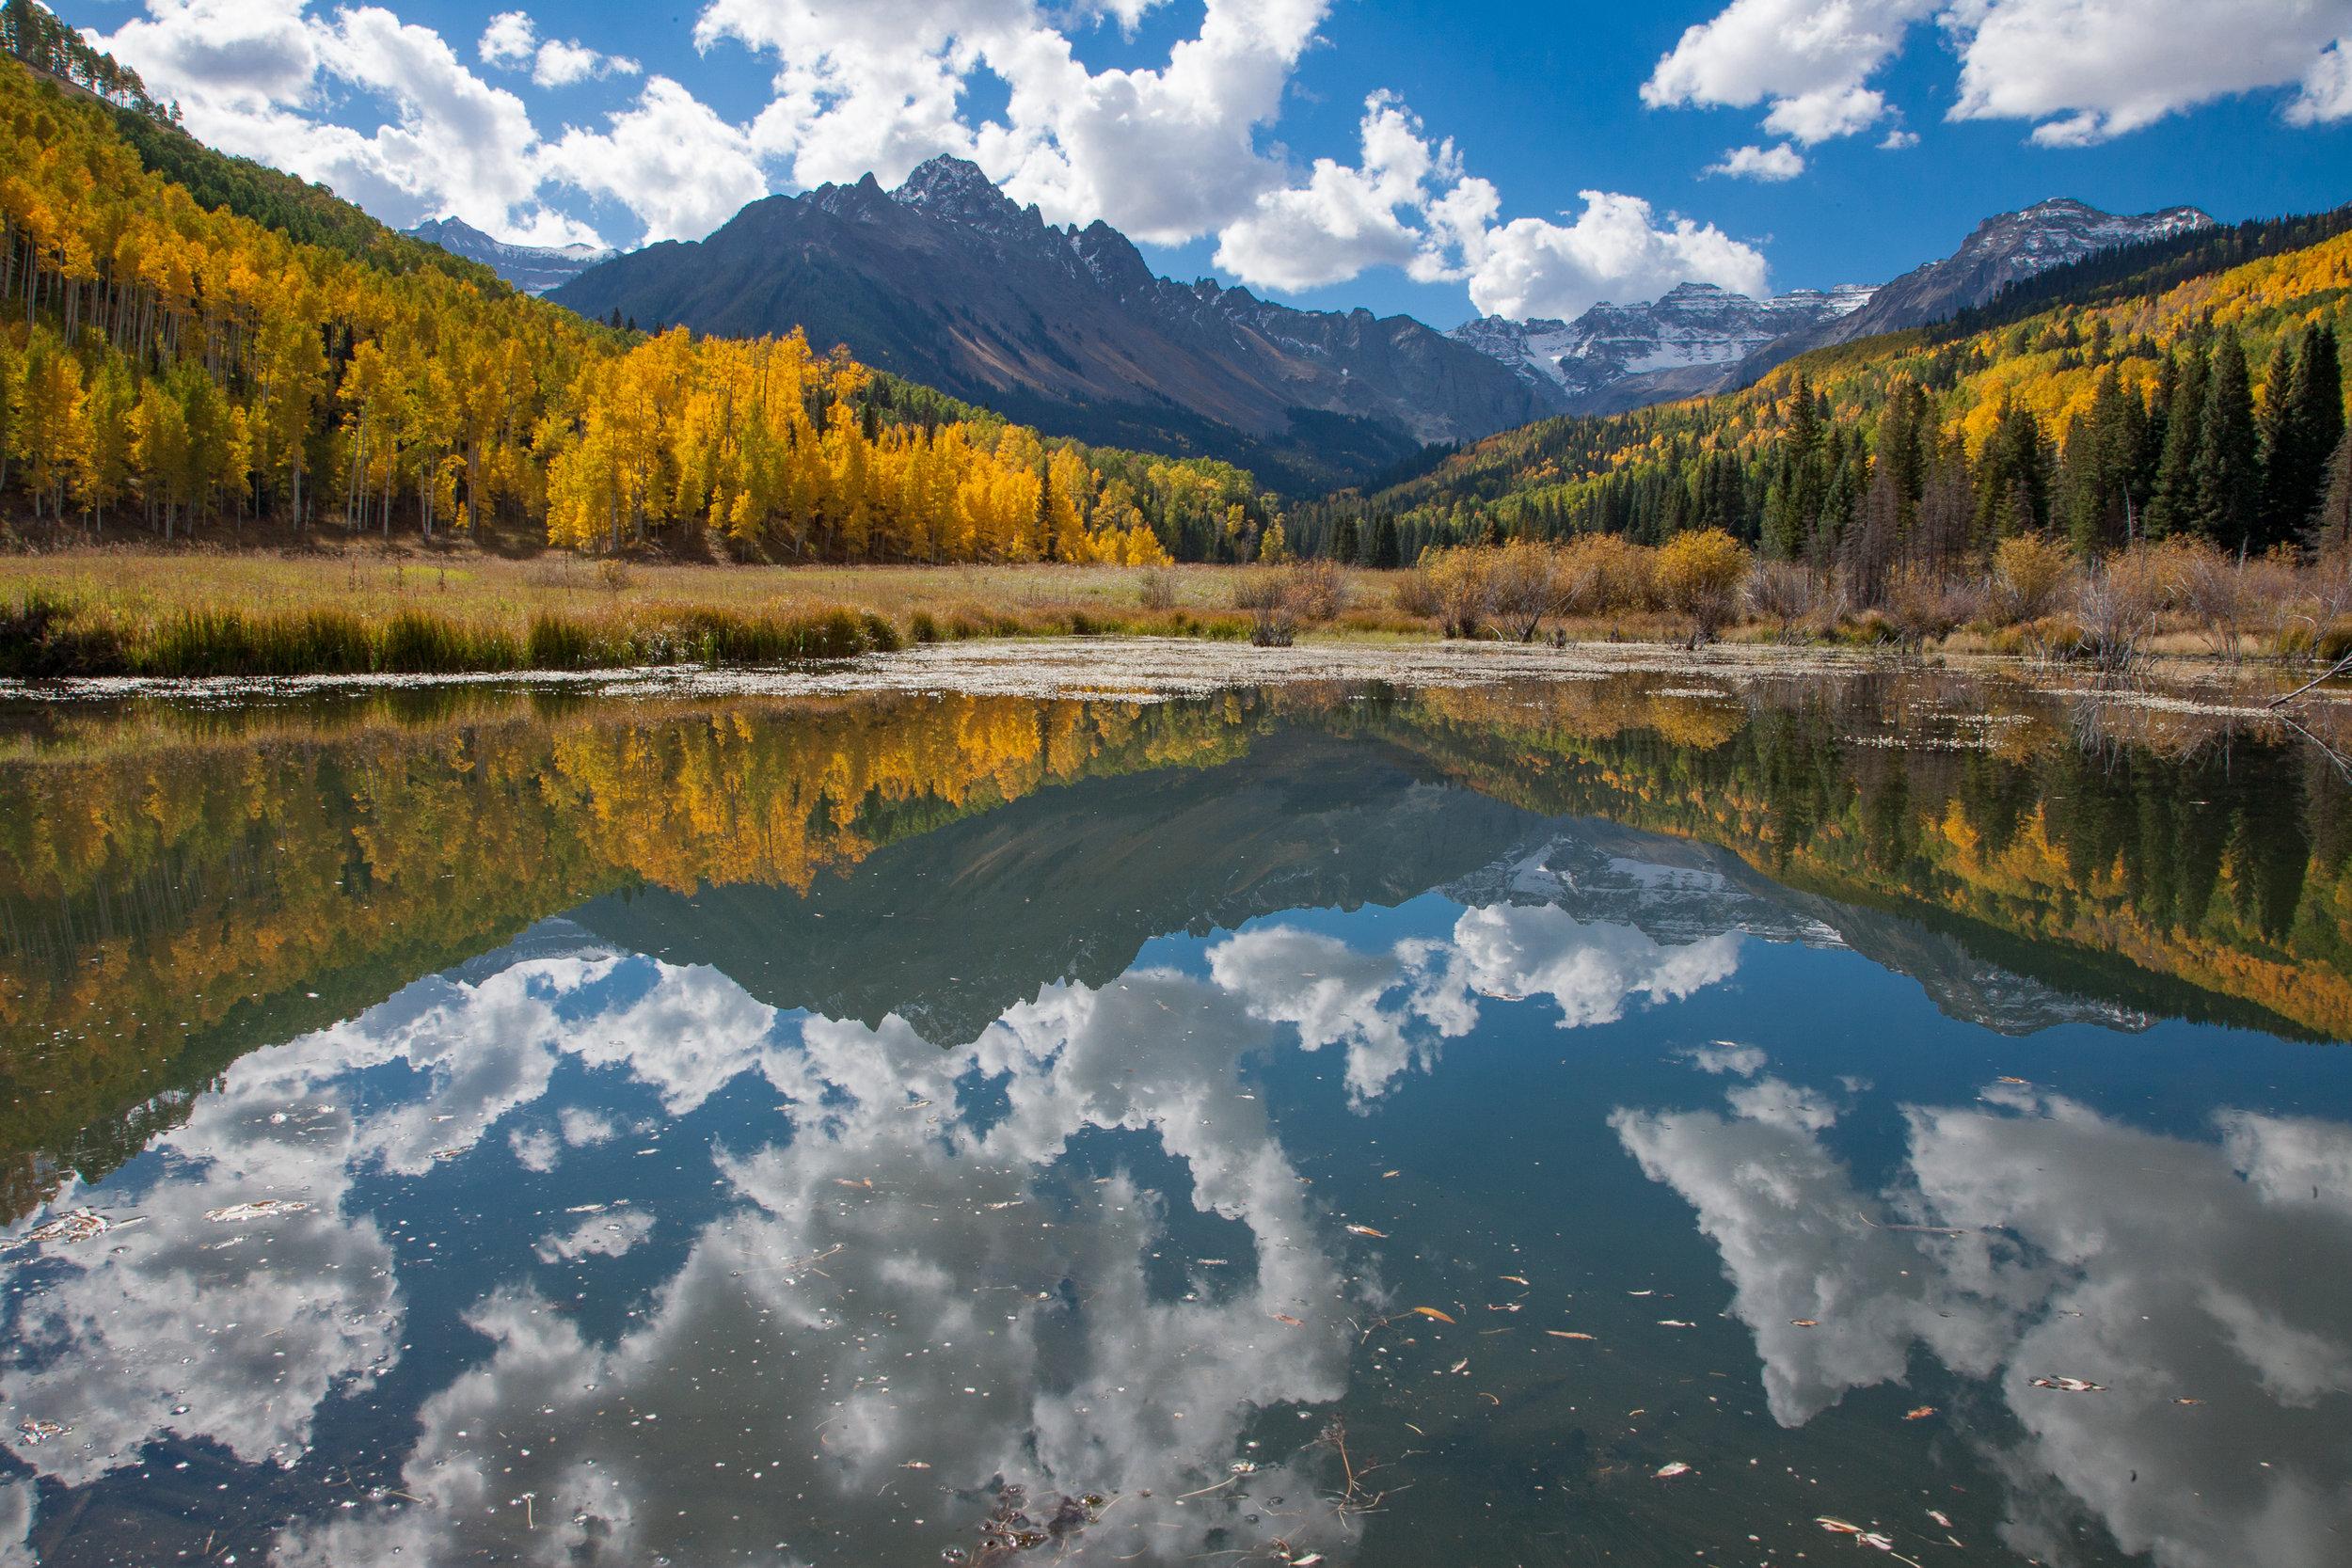 Mt. Sneffels & Bever Pond Lake © Bill Ellzey